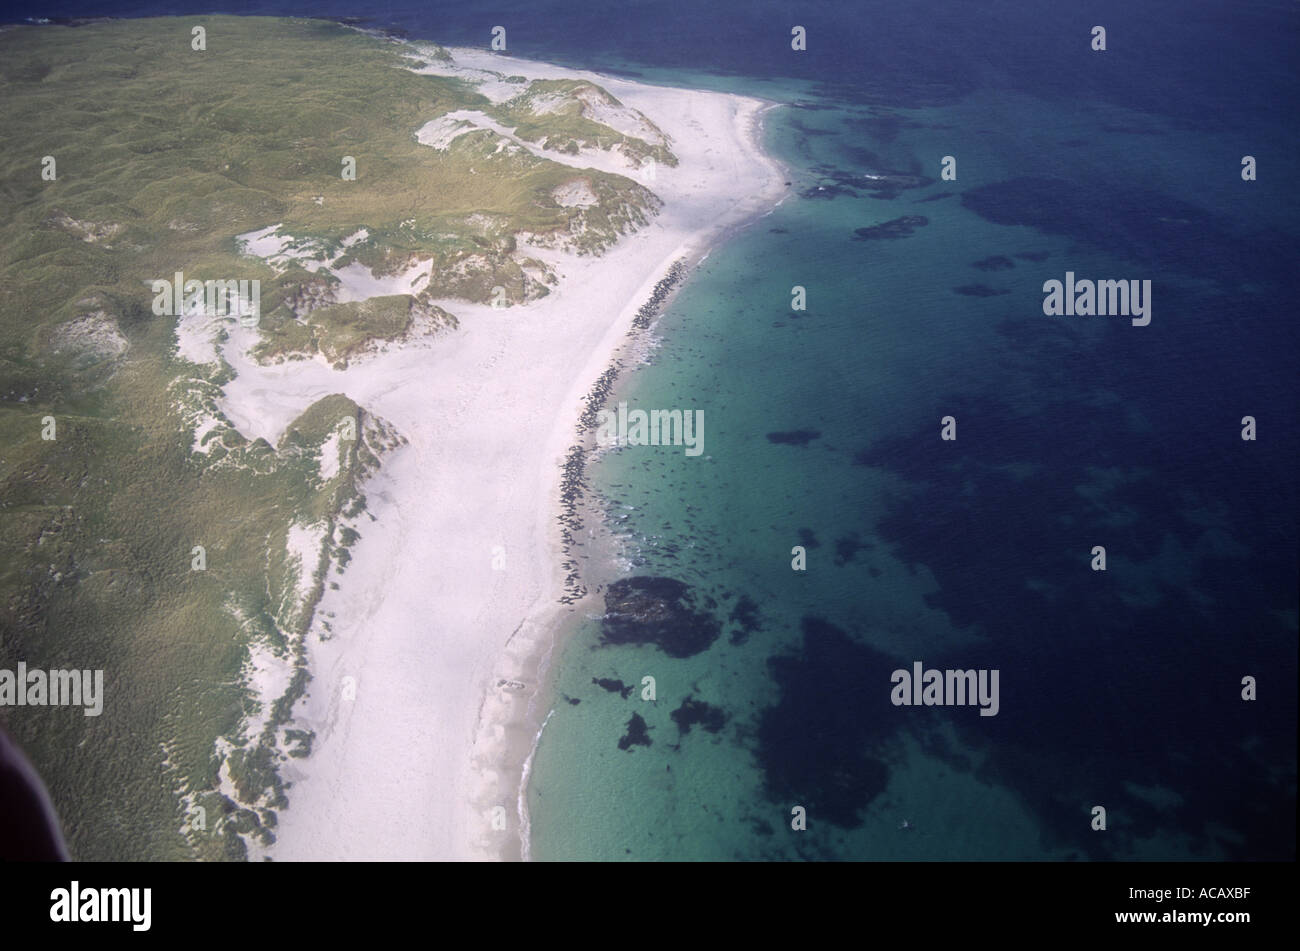 Monach Isles Aerial - Stock Image